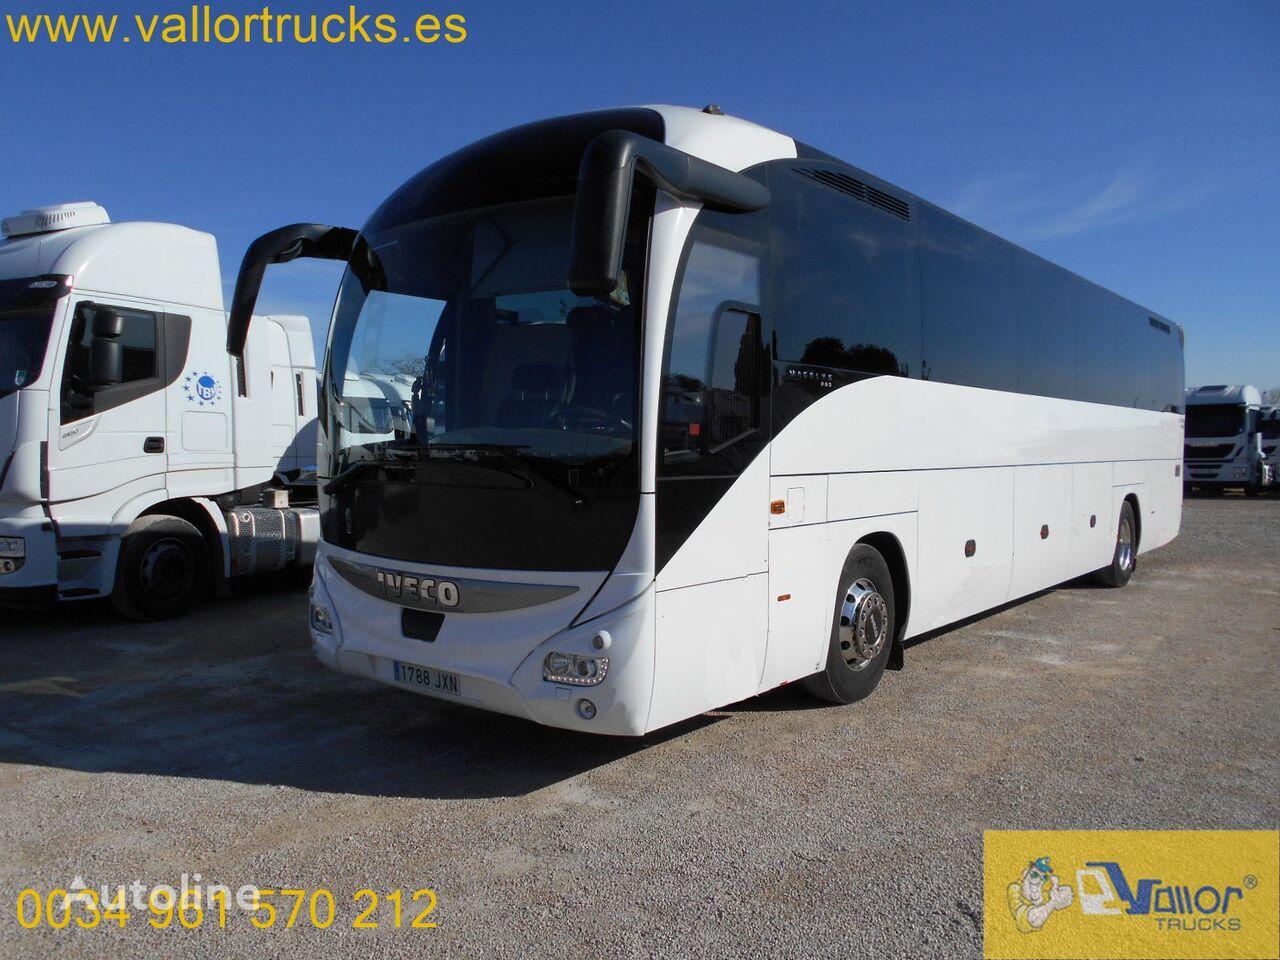 IVECO MAGELYS PRO coach bus